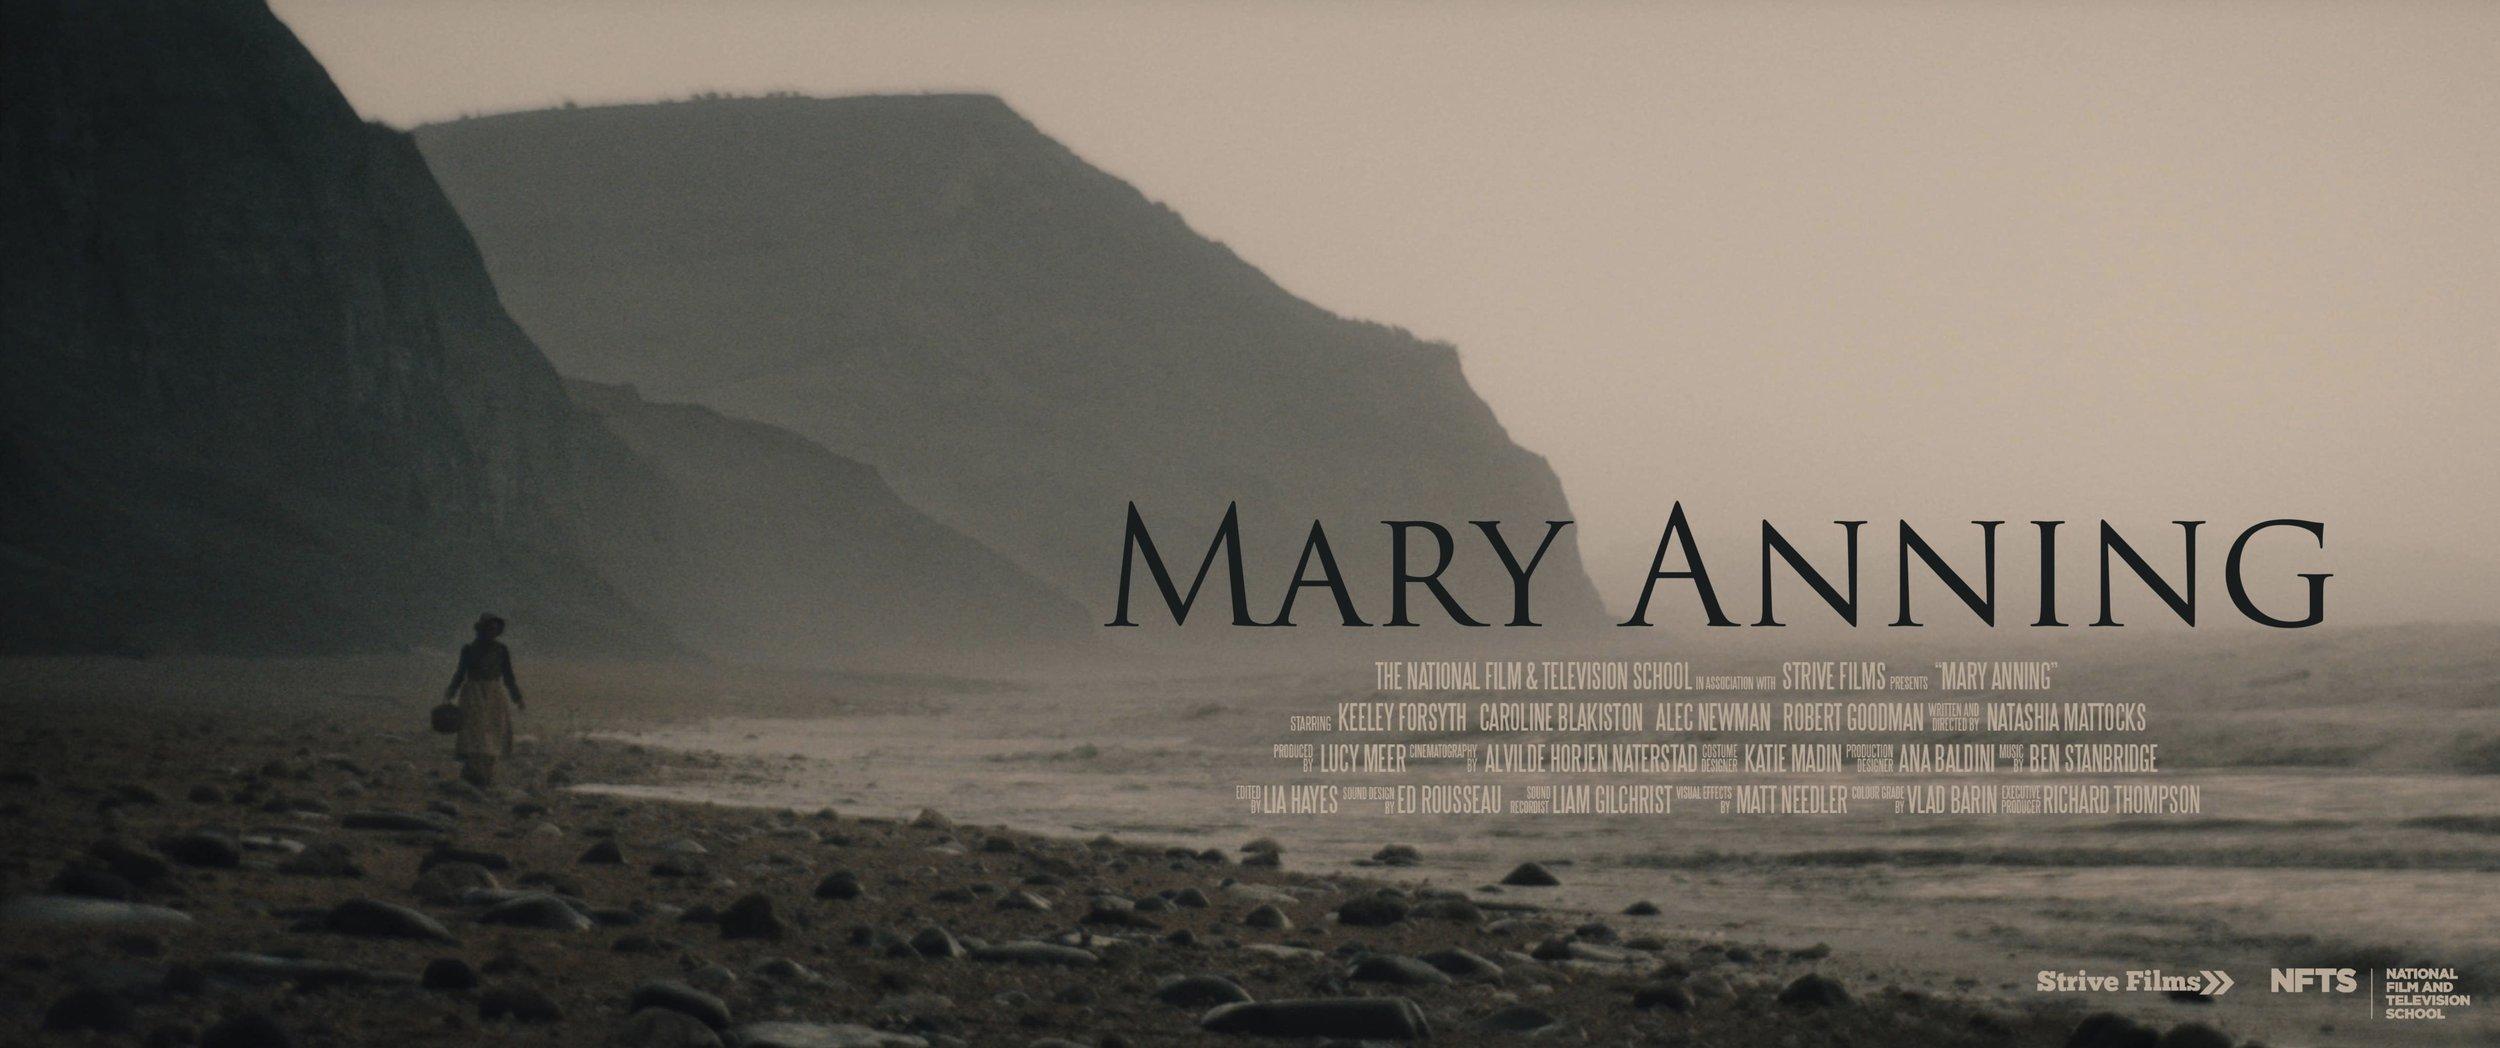 MARY ANNING | 2018 | 21 MINS | DRAMA - BAFTA LONG-LISTED